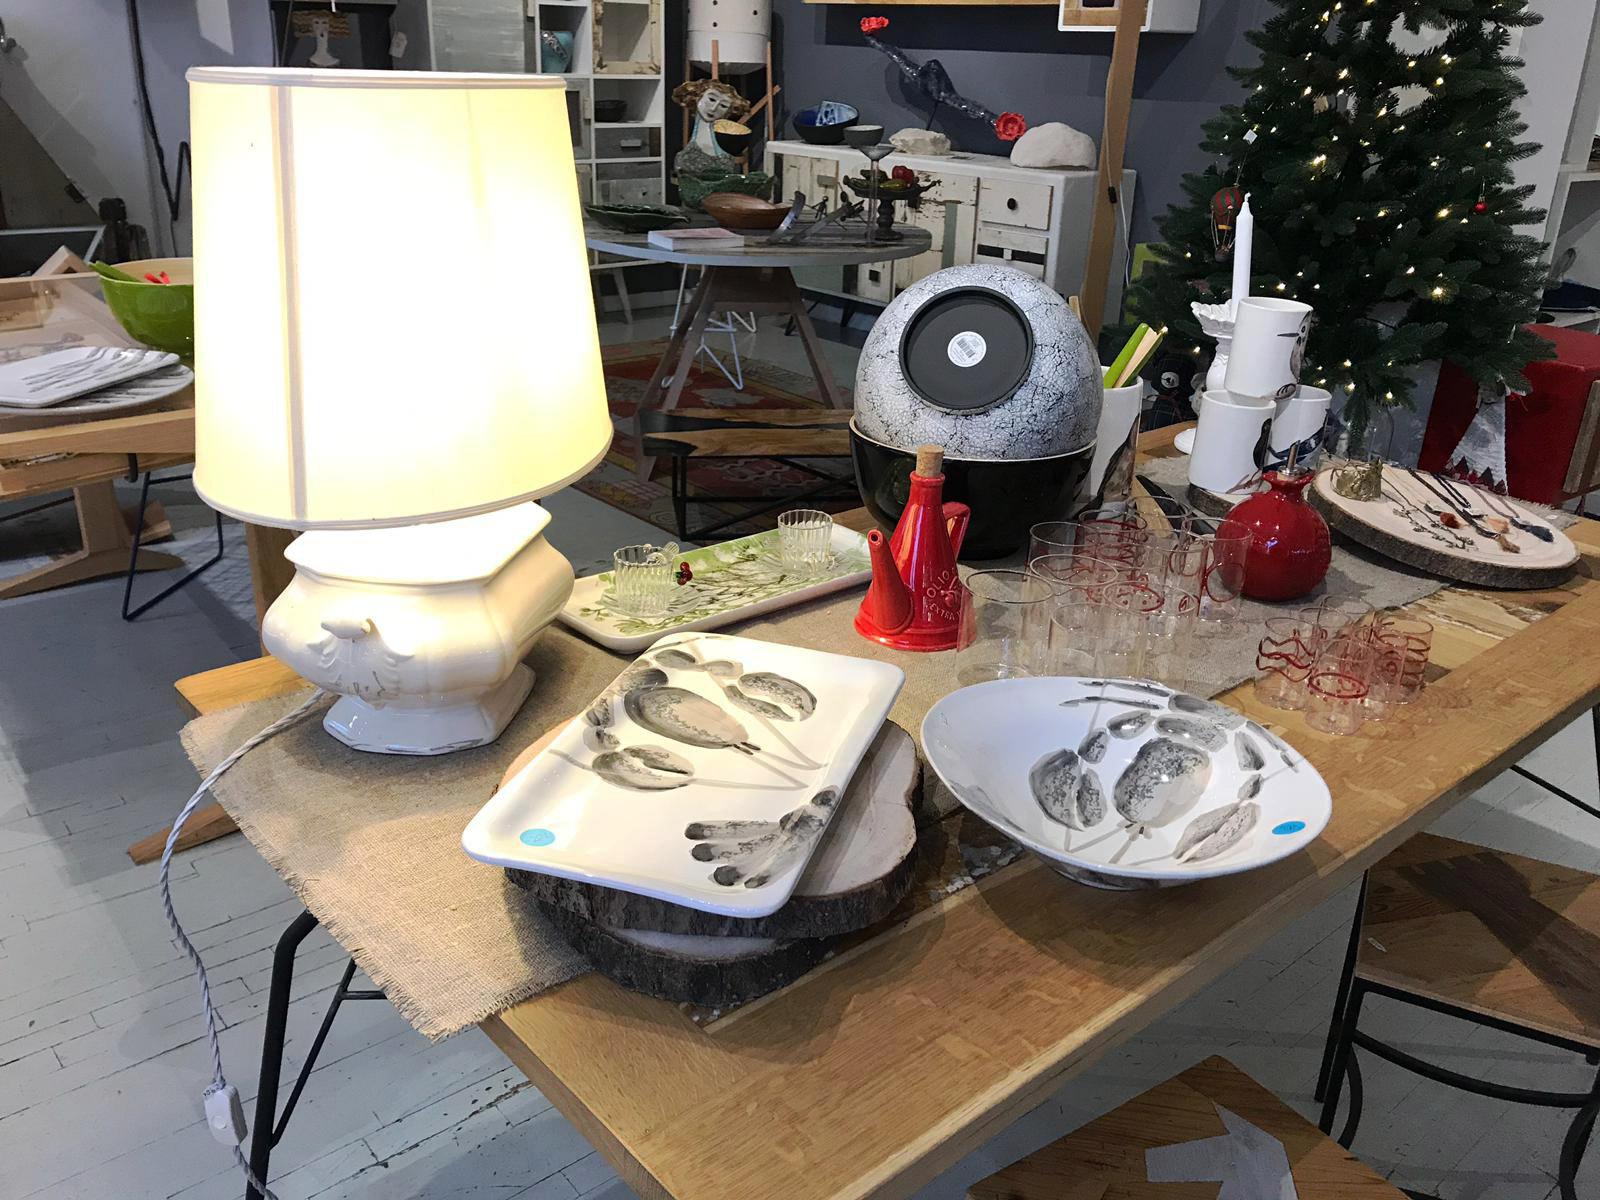 Saldi oggettistica casa roma vassoi piatti ceramica toscana dipinta a mano